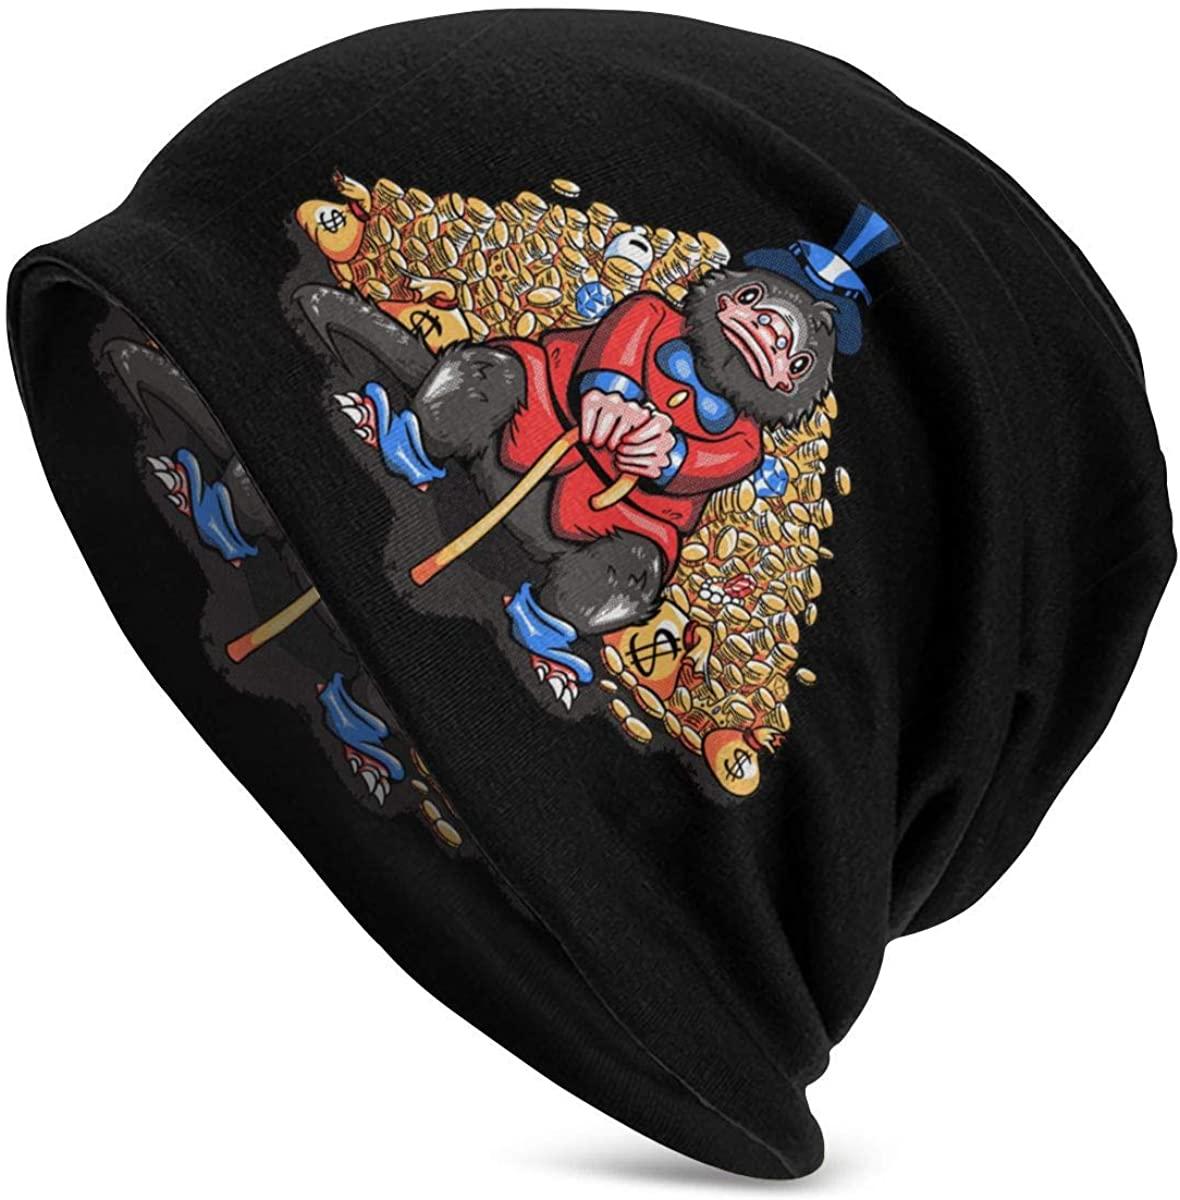 Dxddsdks SNASO Thin Unisex Adult Knit Hats Beanie Hat Winter Warm Printing Cap Black